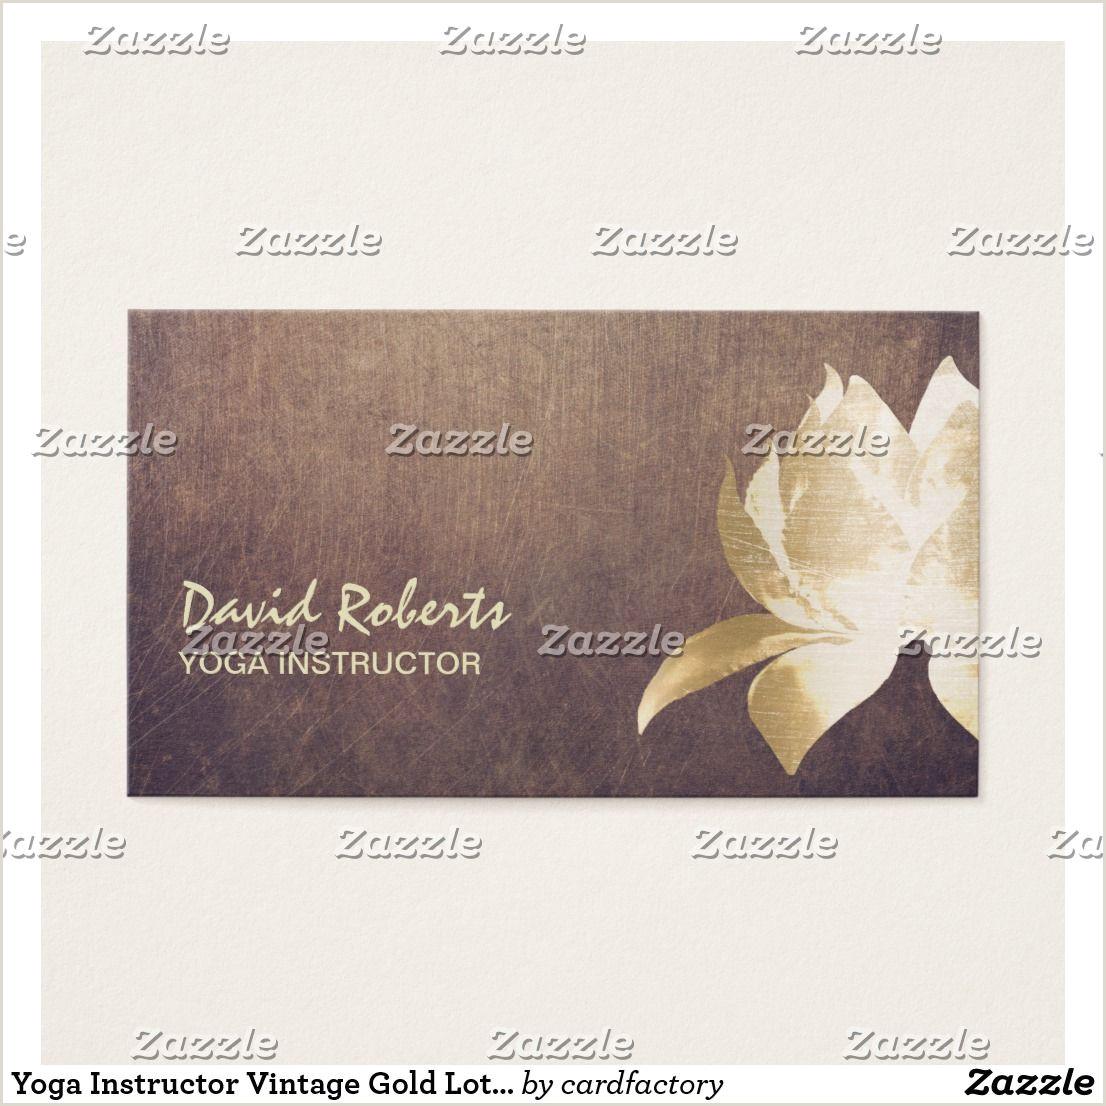 Forbes Best Business Cards Yoga Instructor Vintage Gold Lotus Flower Business Card